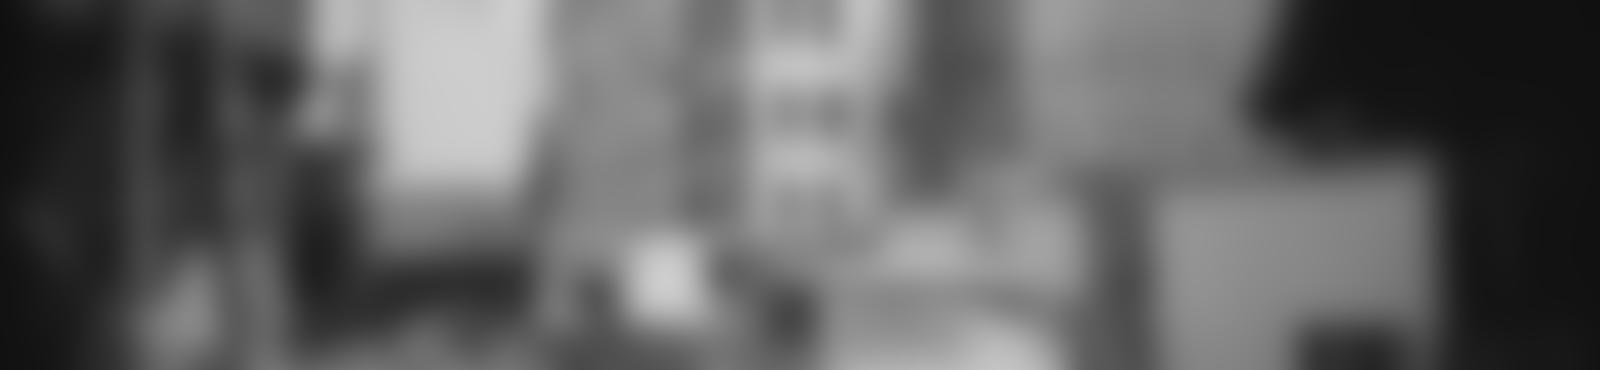 Blurred b82a123c 2342 4f7a 8615 44d9c1776434